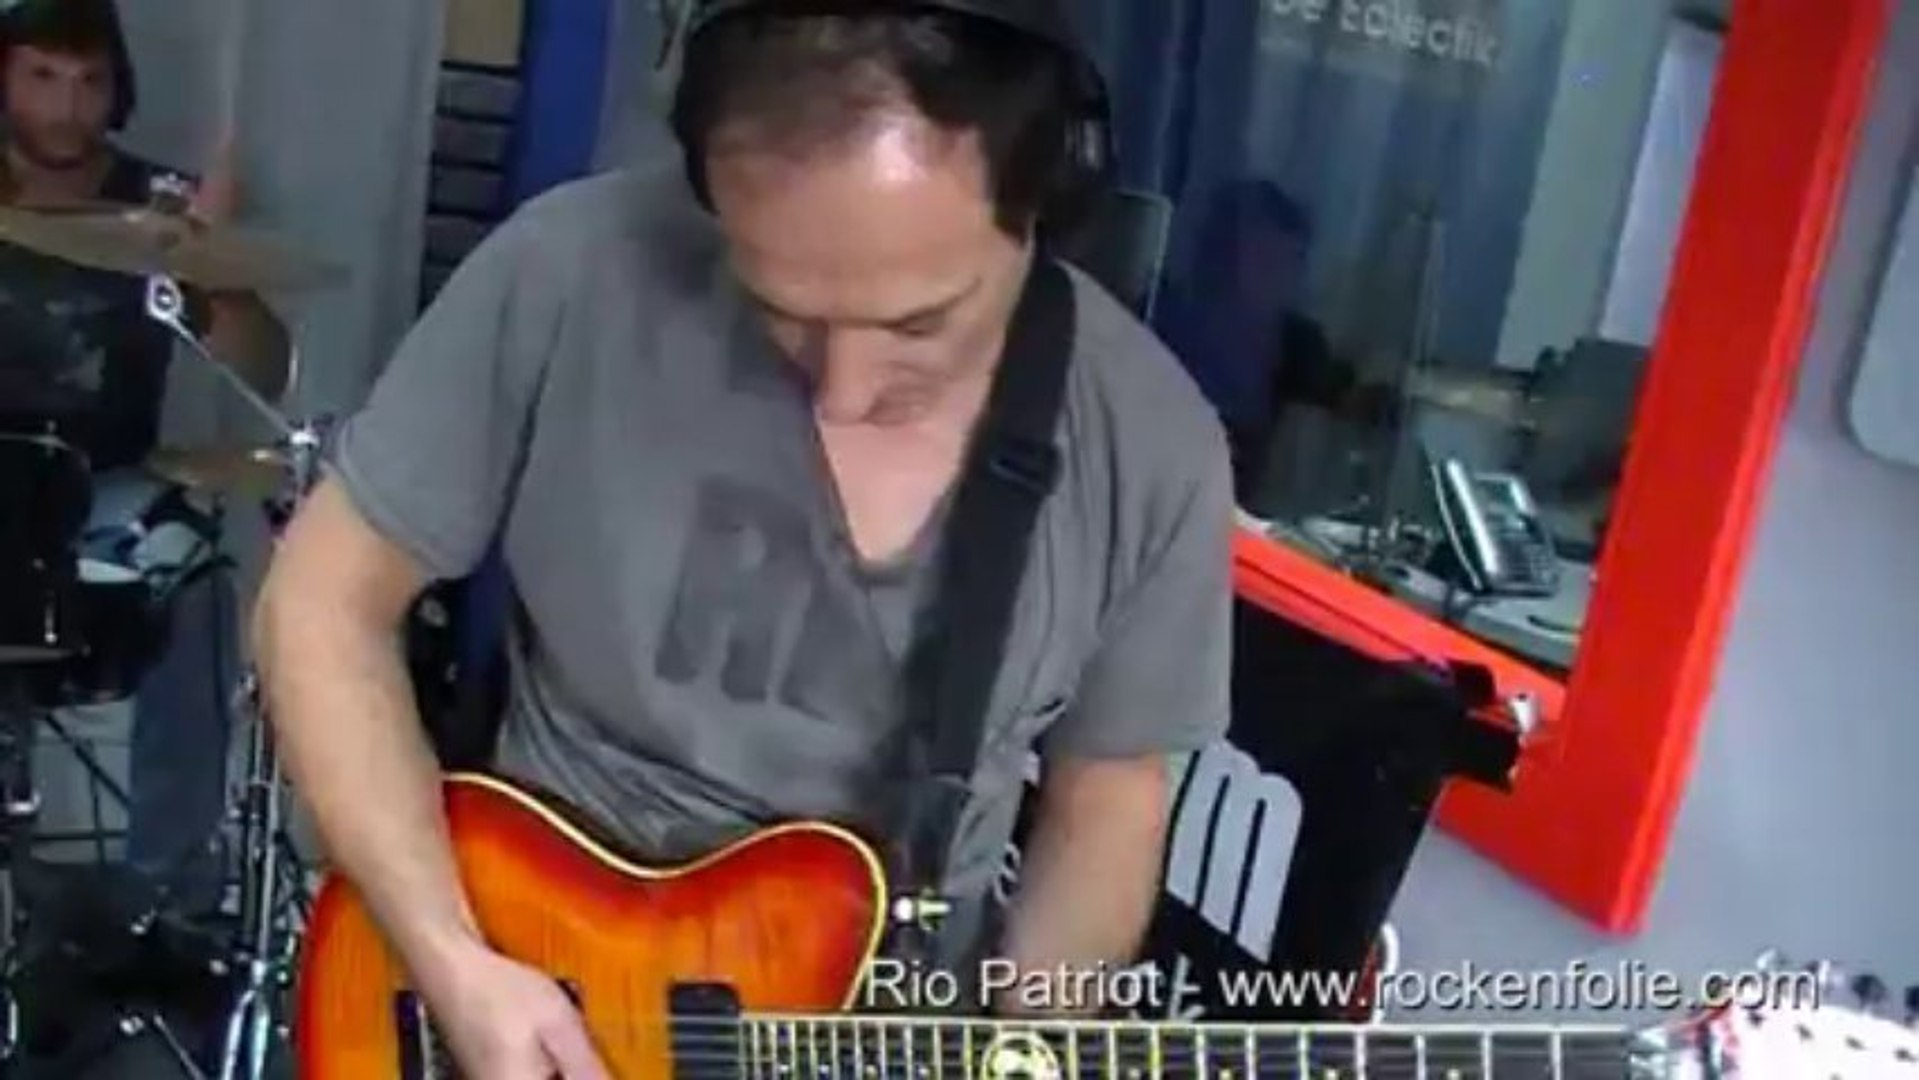 Rio Patriot - Live Rockenfolie